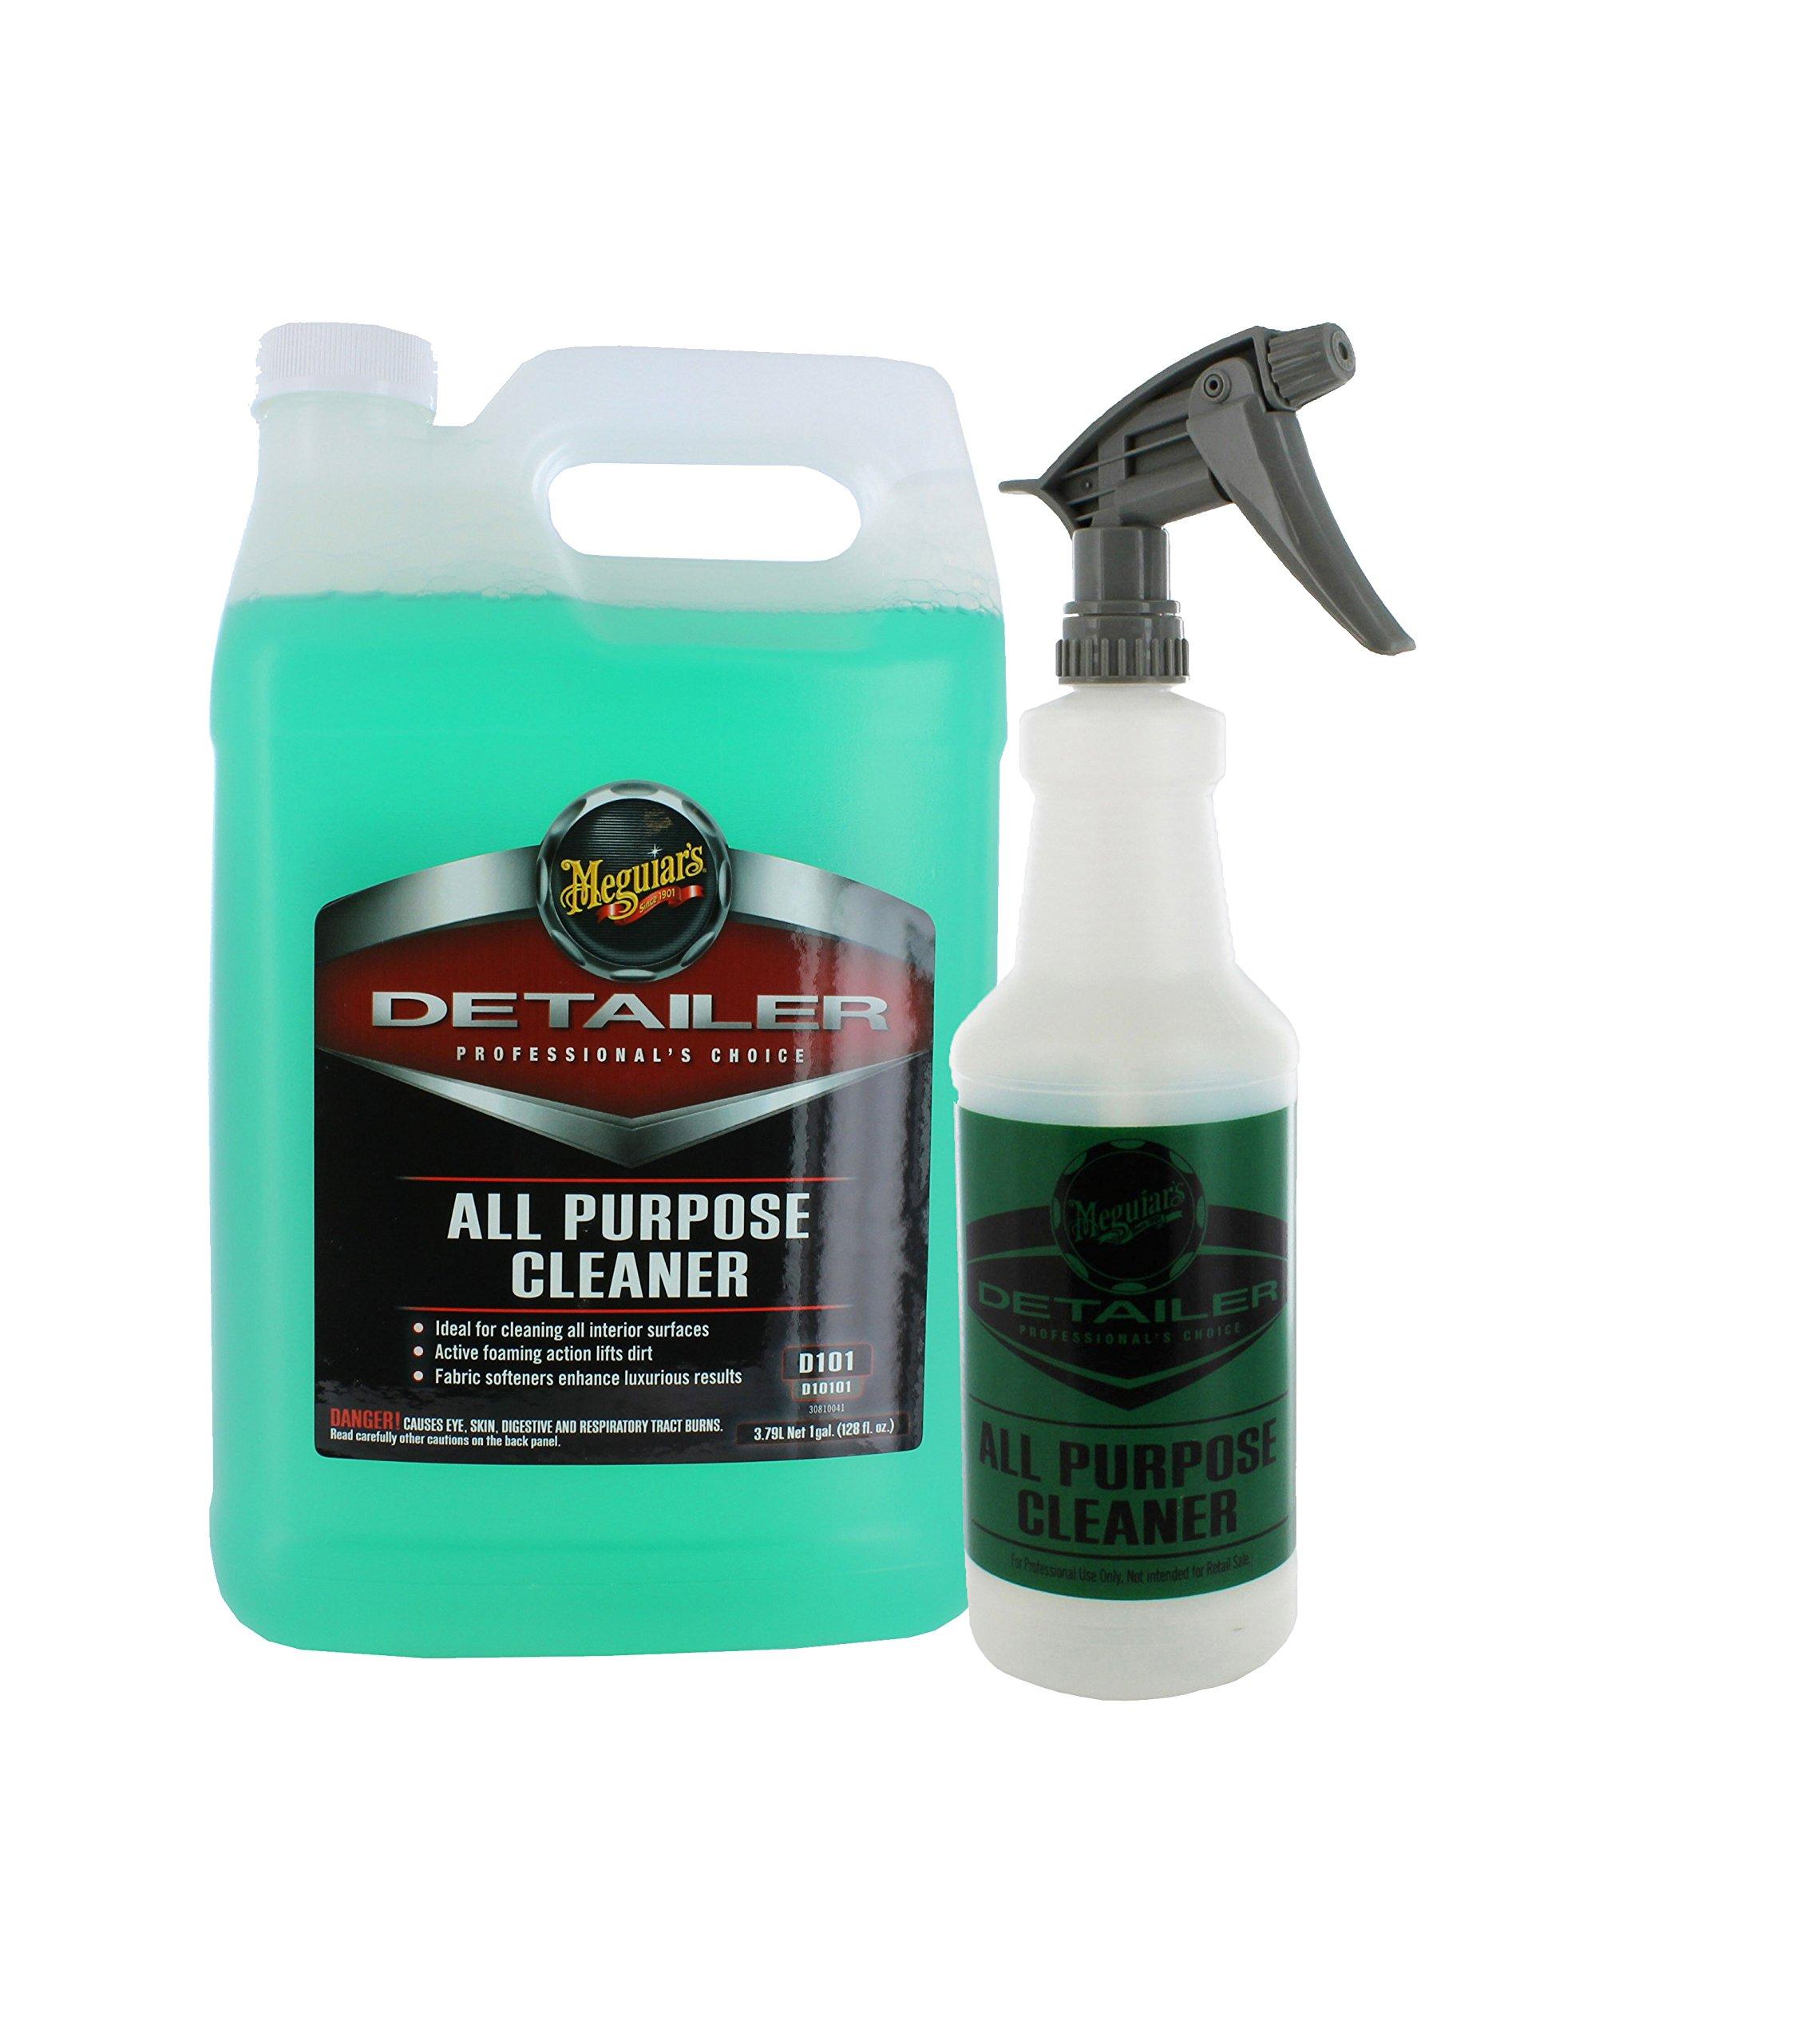 Meguiar's All Purpose Cleaner Kit